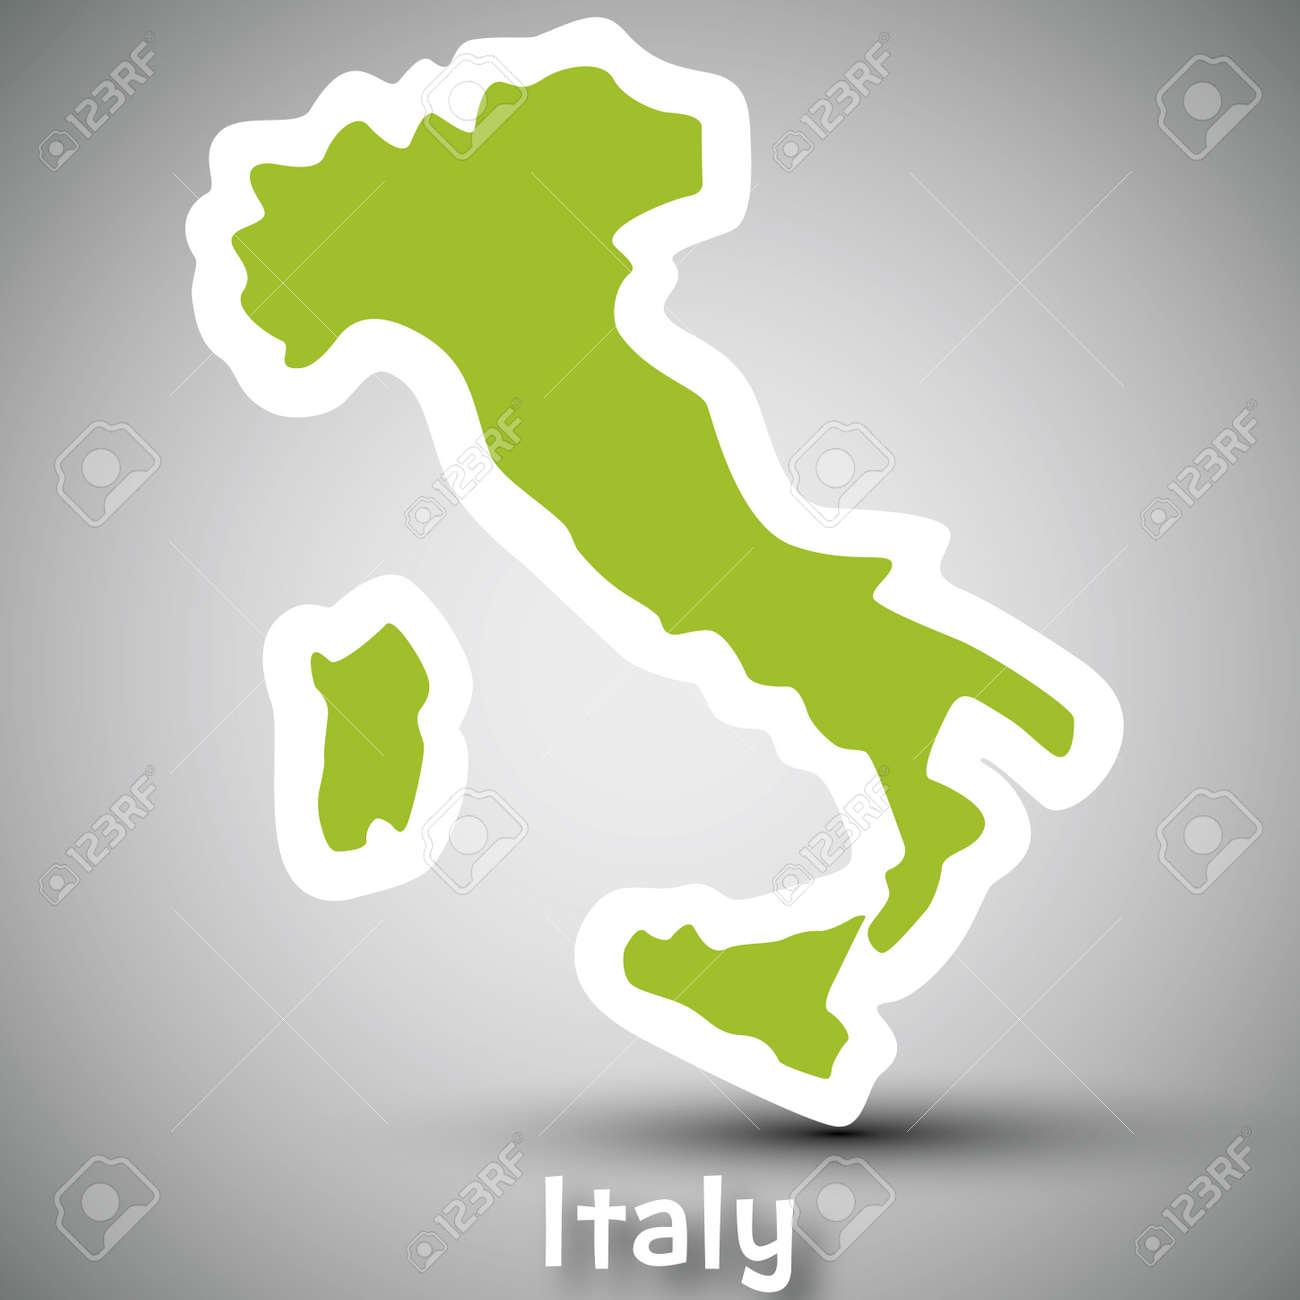 Italy map sticker Stock Vector - 17884880